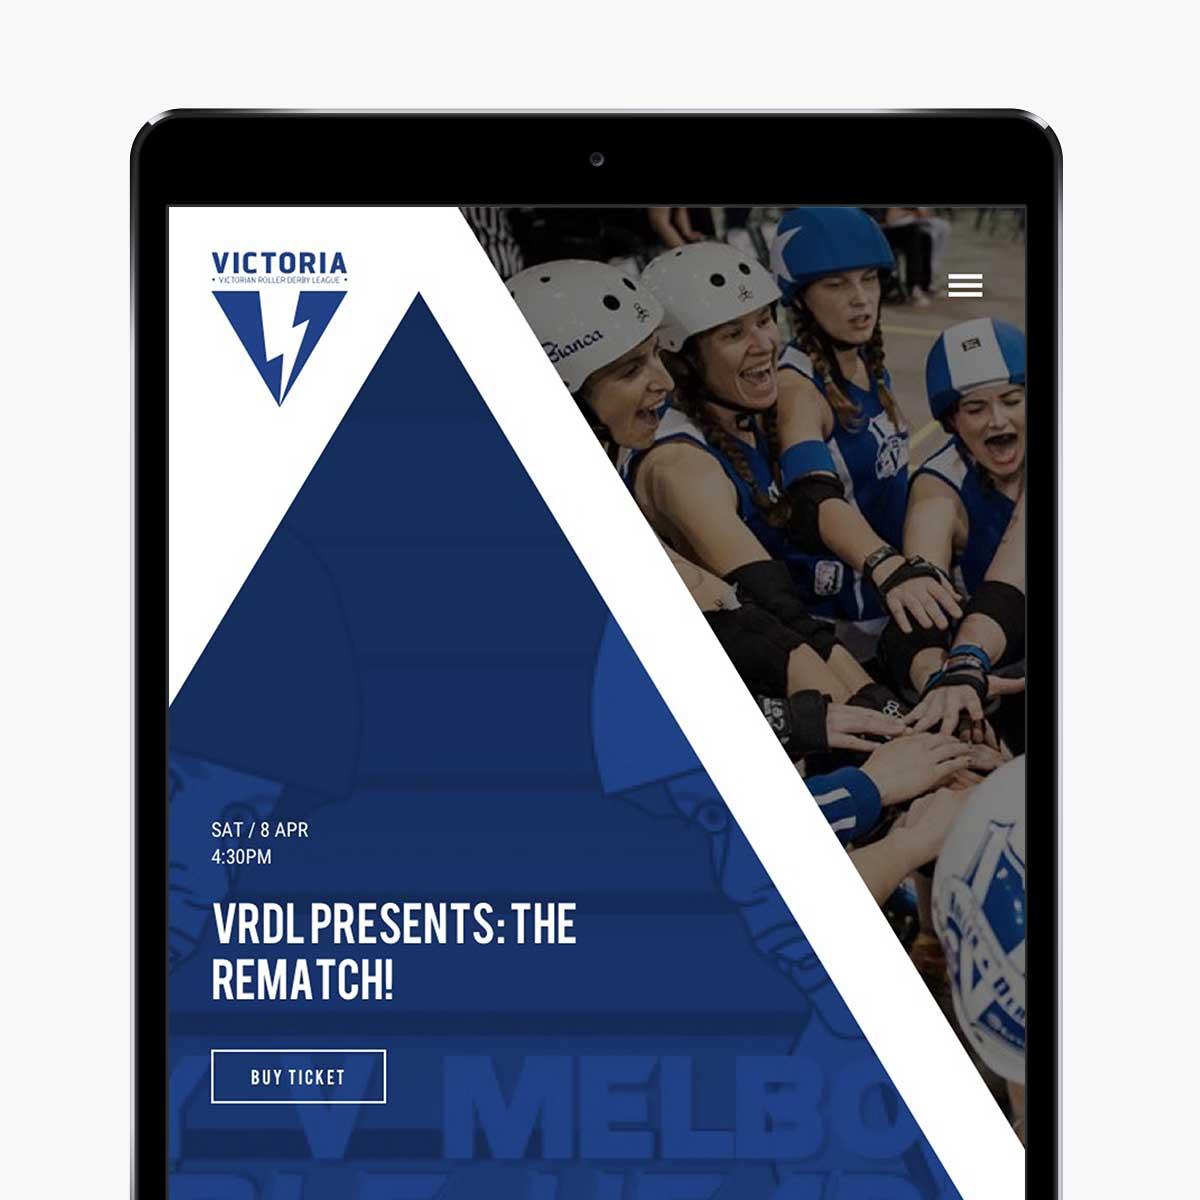 Victorian Roller Derby League responsive website design on iPad in portrait view